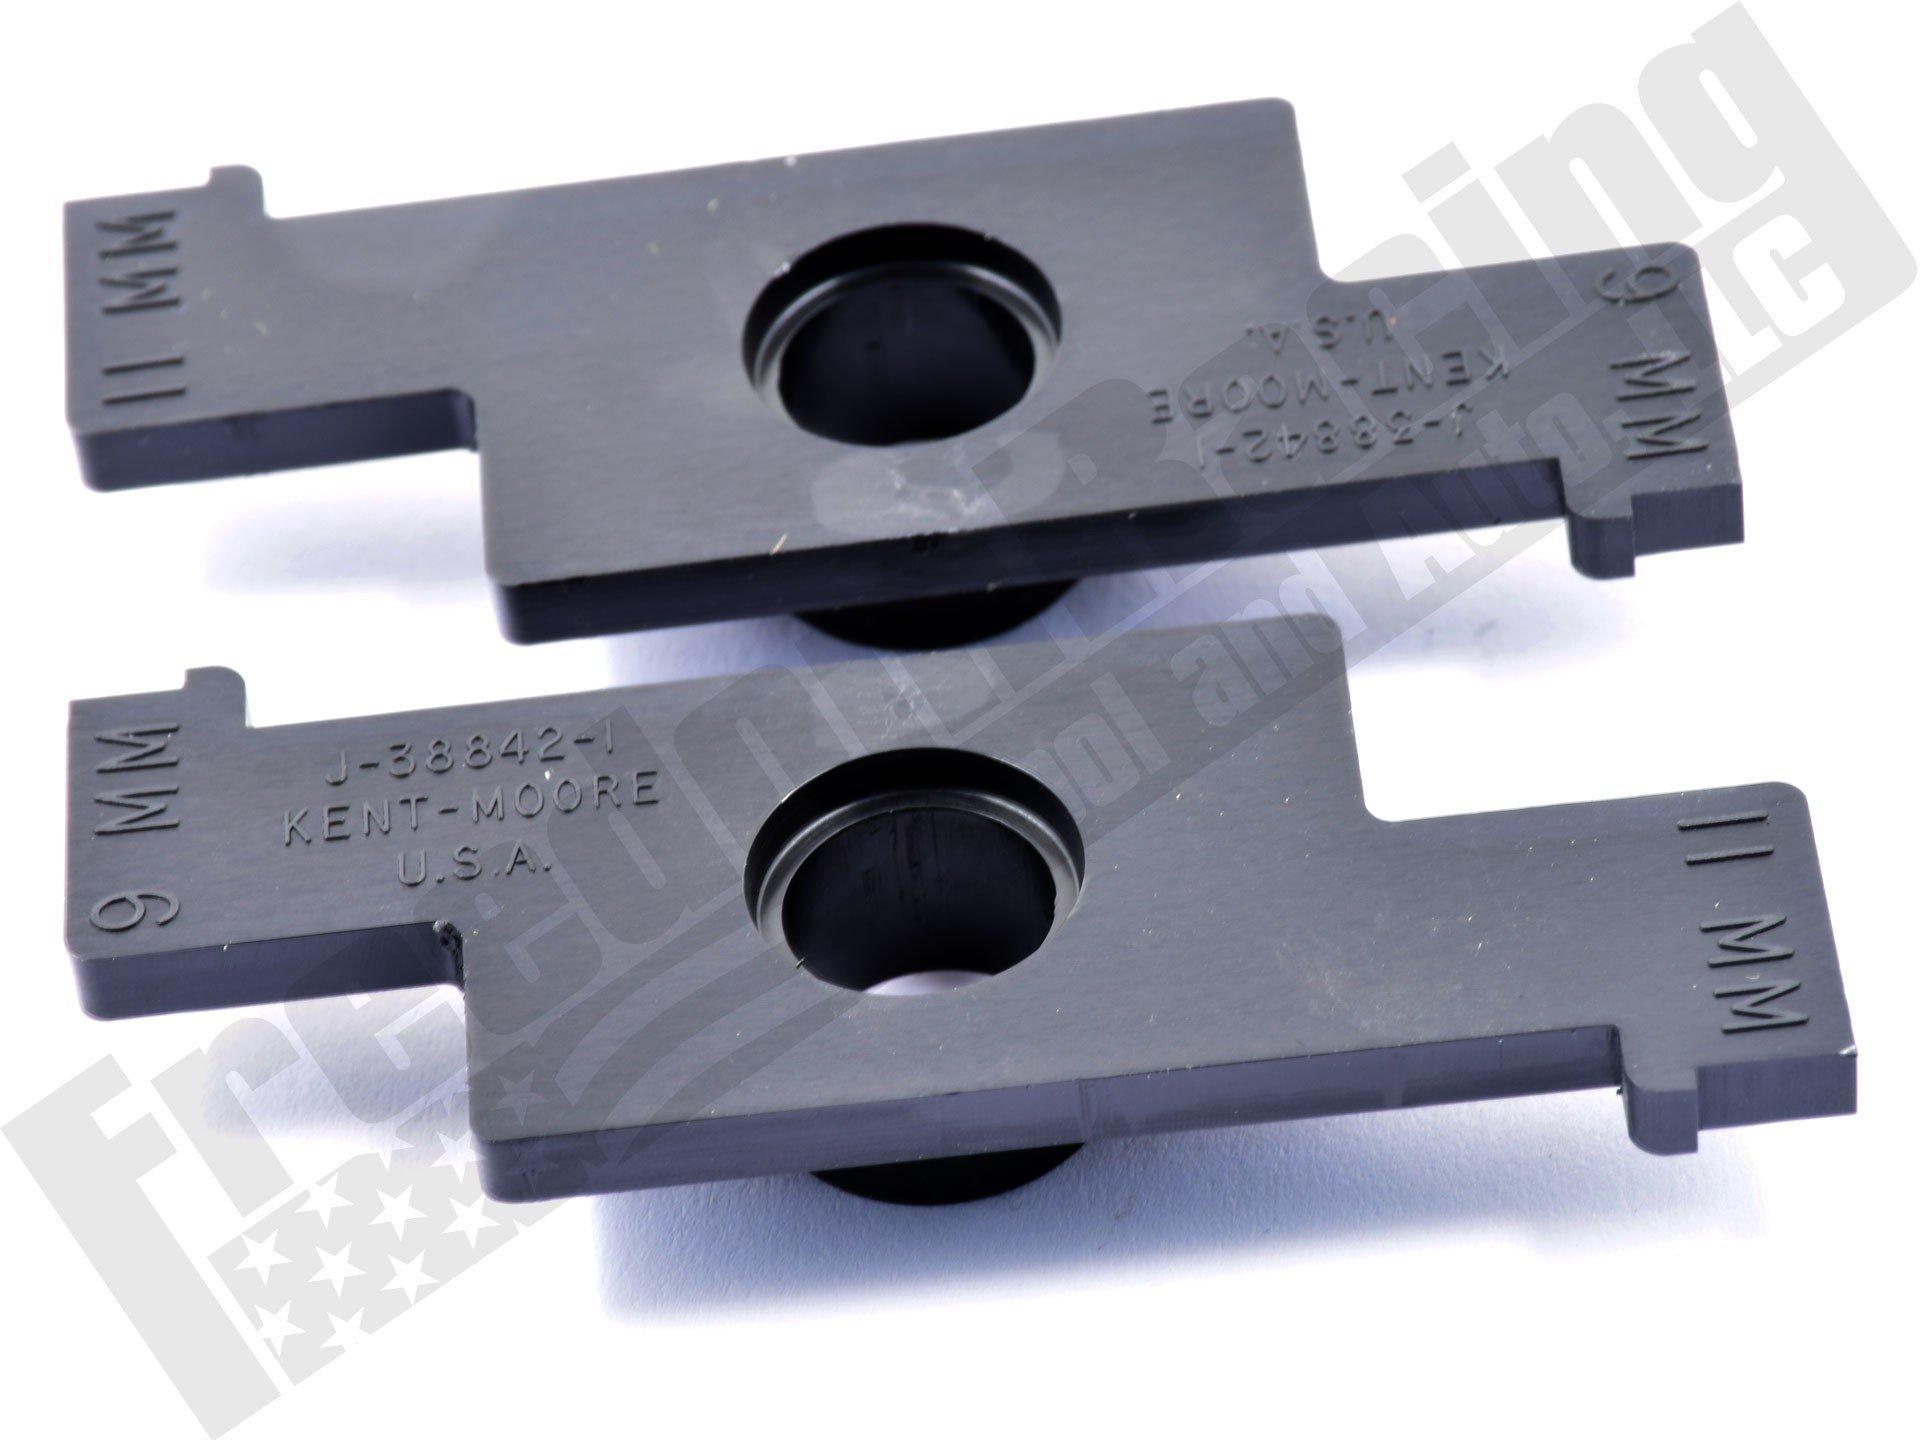 Kent-Moore J-38842 Convertible Top Locking Pin Alignment Tool For Buick Reatta